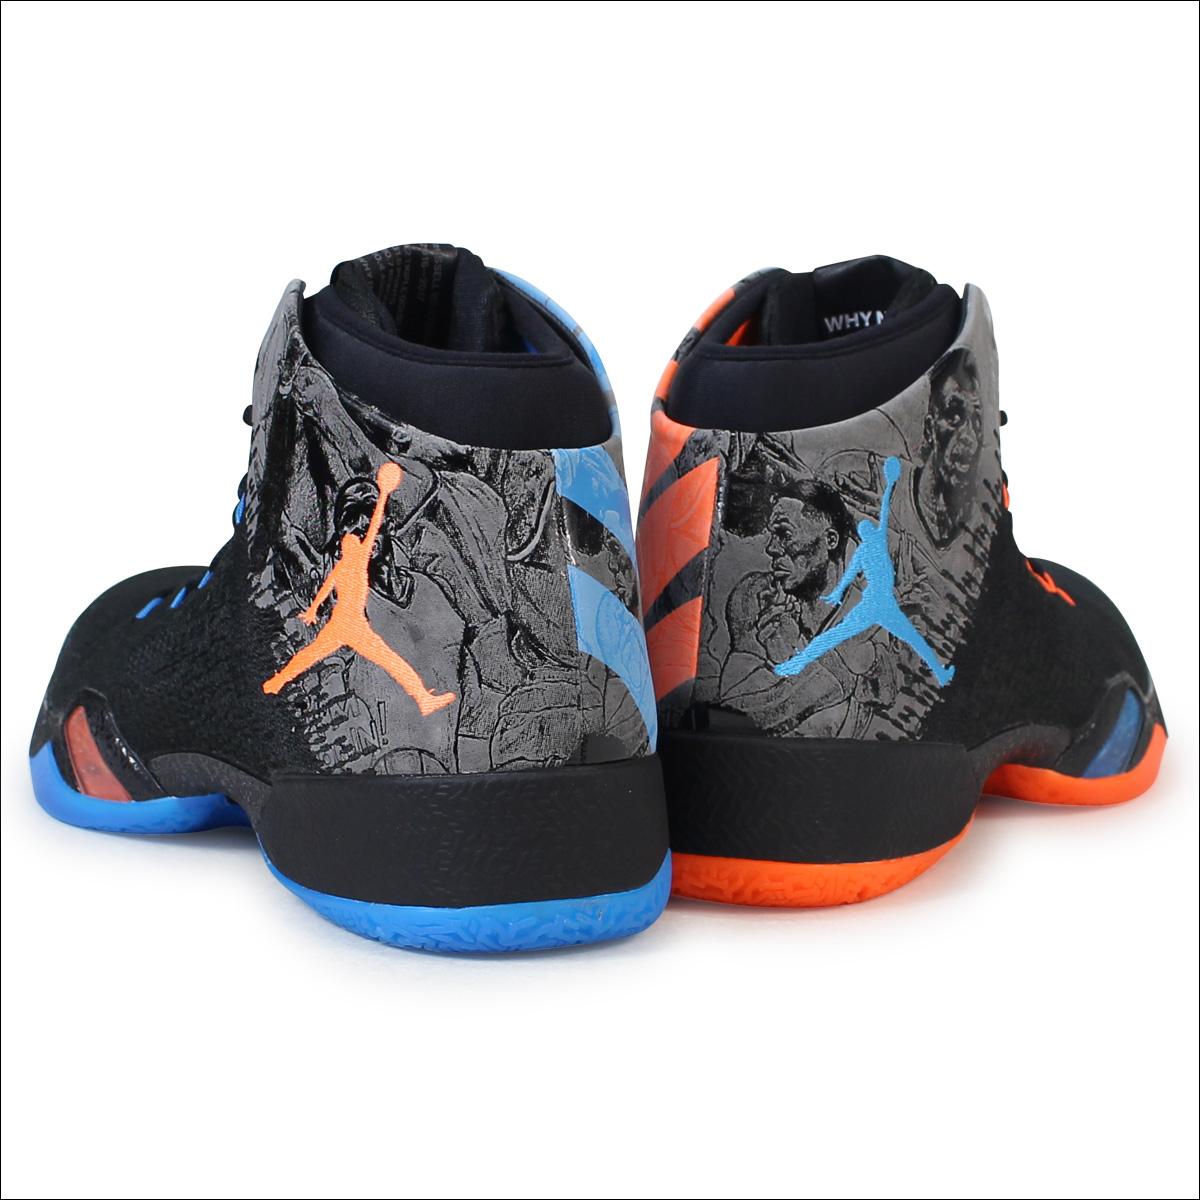 buy online 7c140 5e438 NIKE Nike Air Jordan 31 sneakers AIR JORDAN XXXI Russell Westbrook MVP  AA9794-023 men shoes black